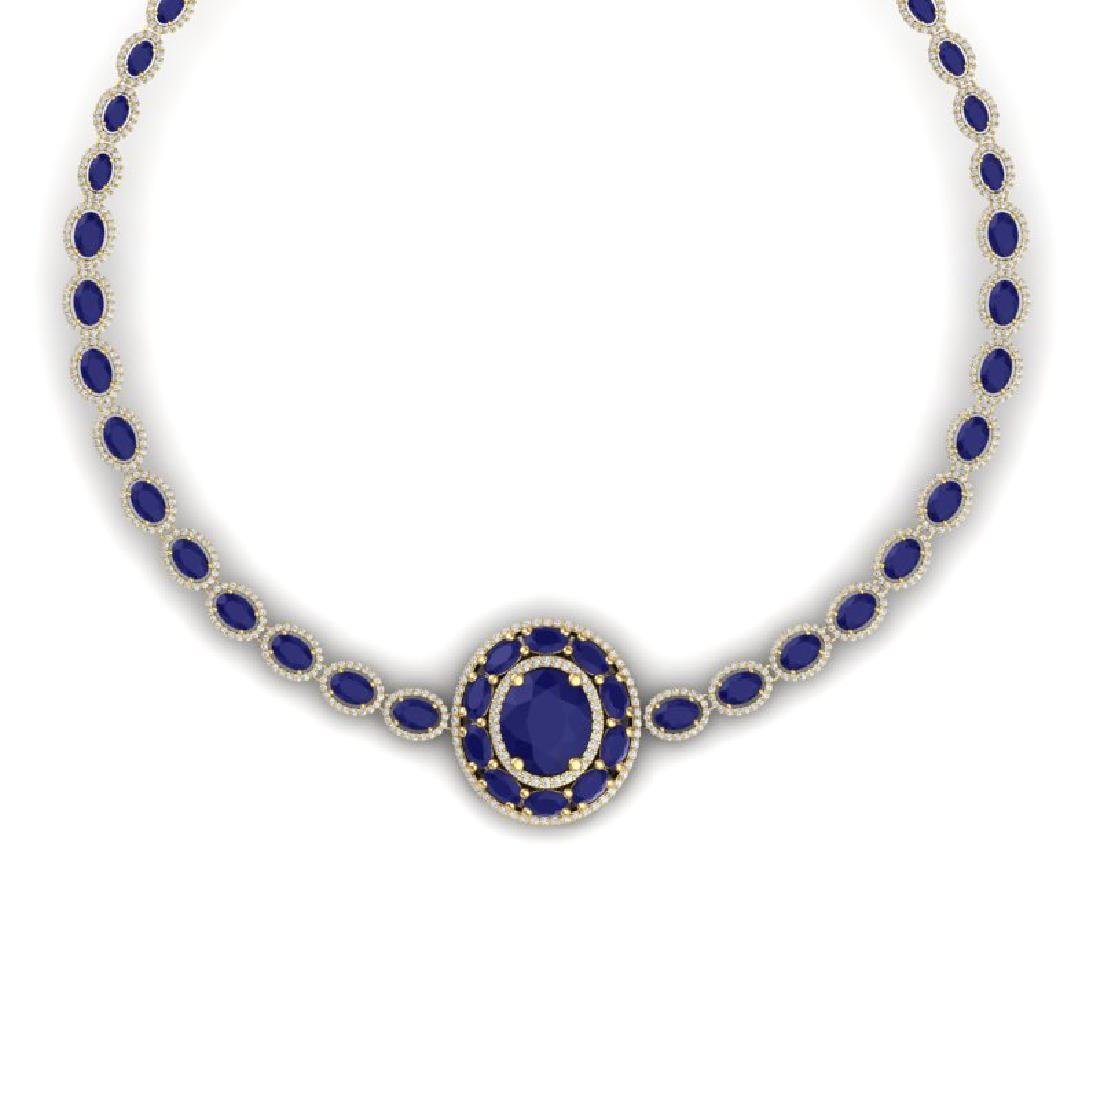 43.54 CTW Royalty Sapphire & VS Diamond Necklace 18K - 2